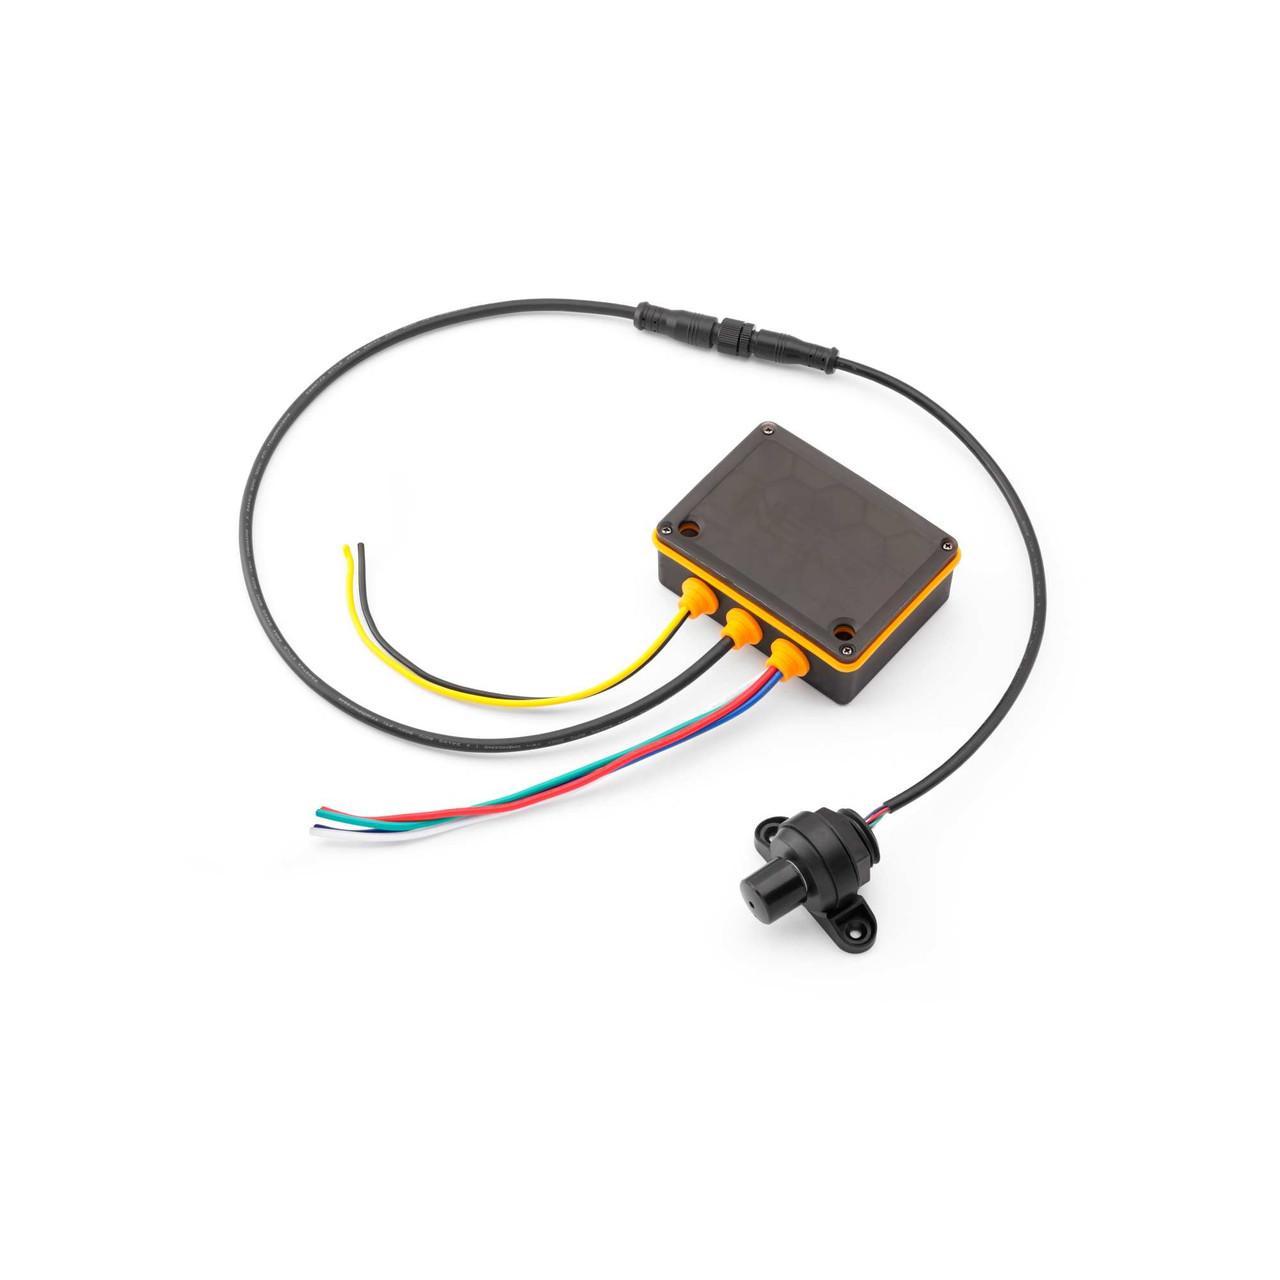 jl audio mlc rw marine led lighting controller with wifi creative audio [ 1280 x 961 Pixel ]